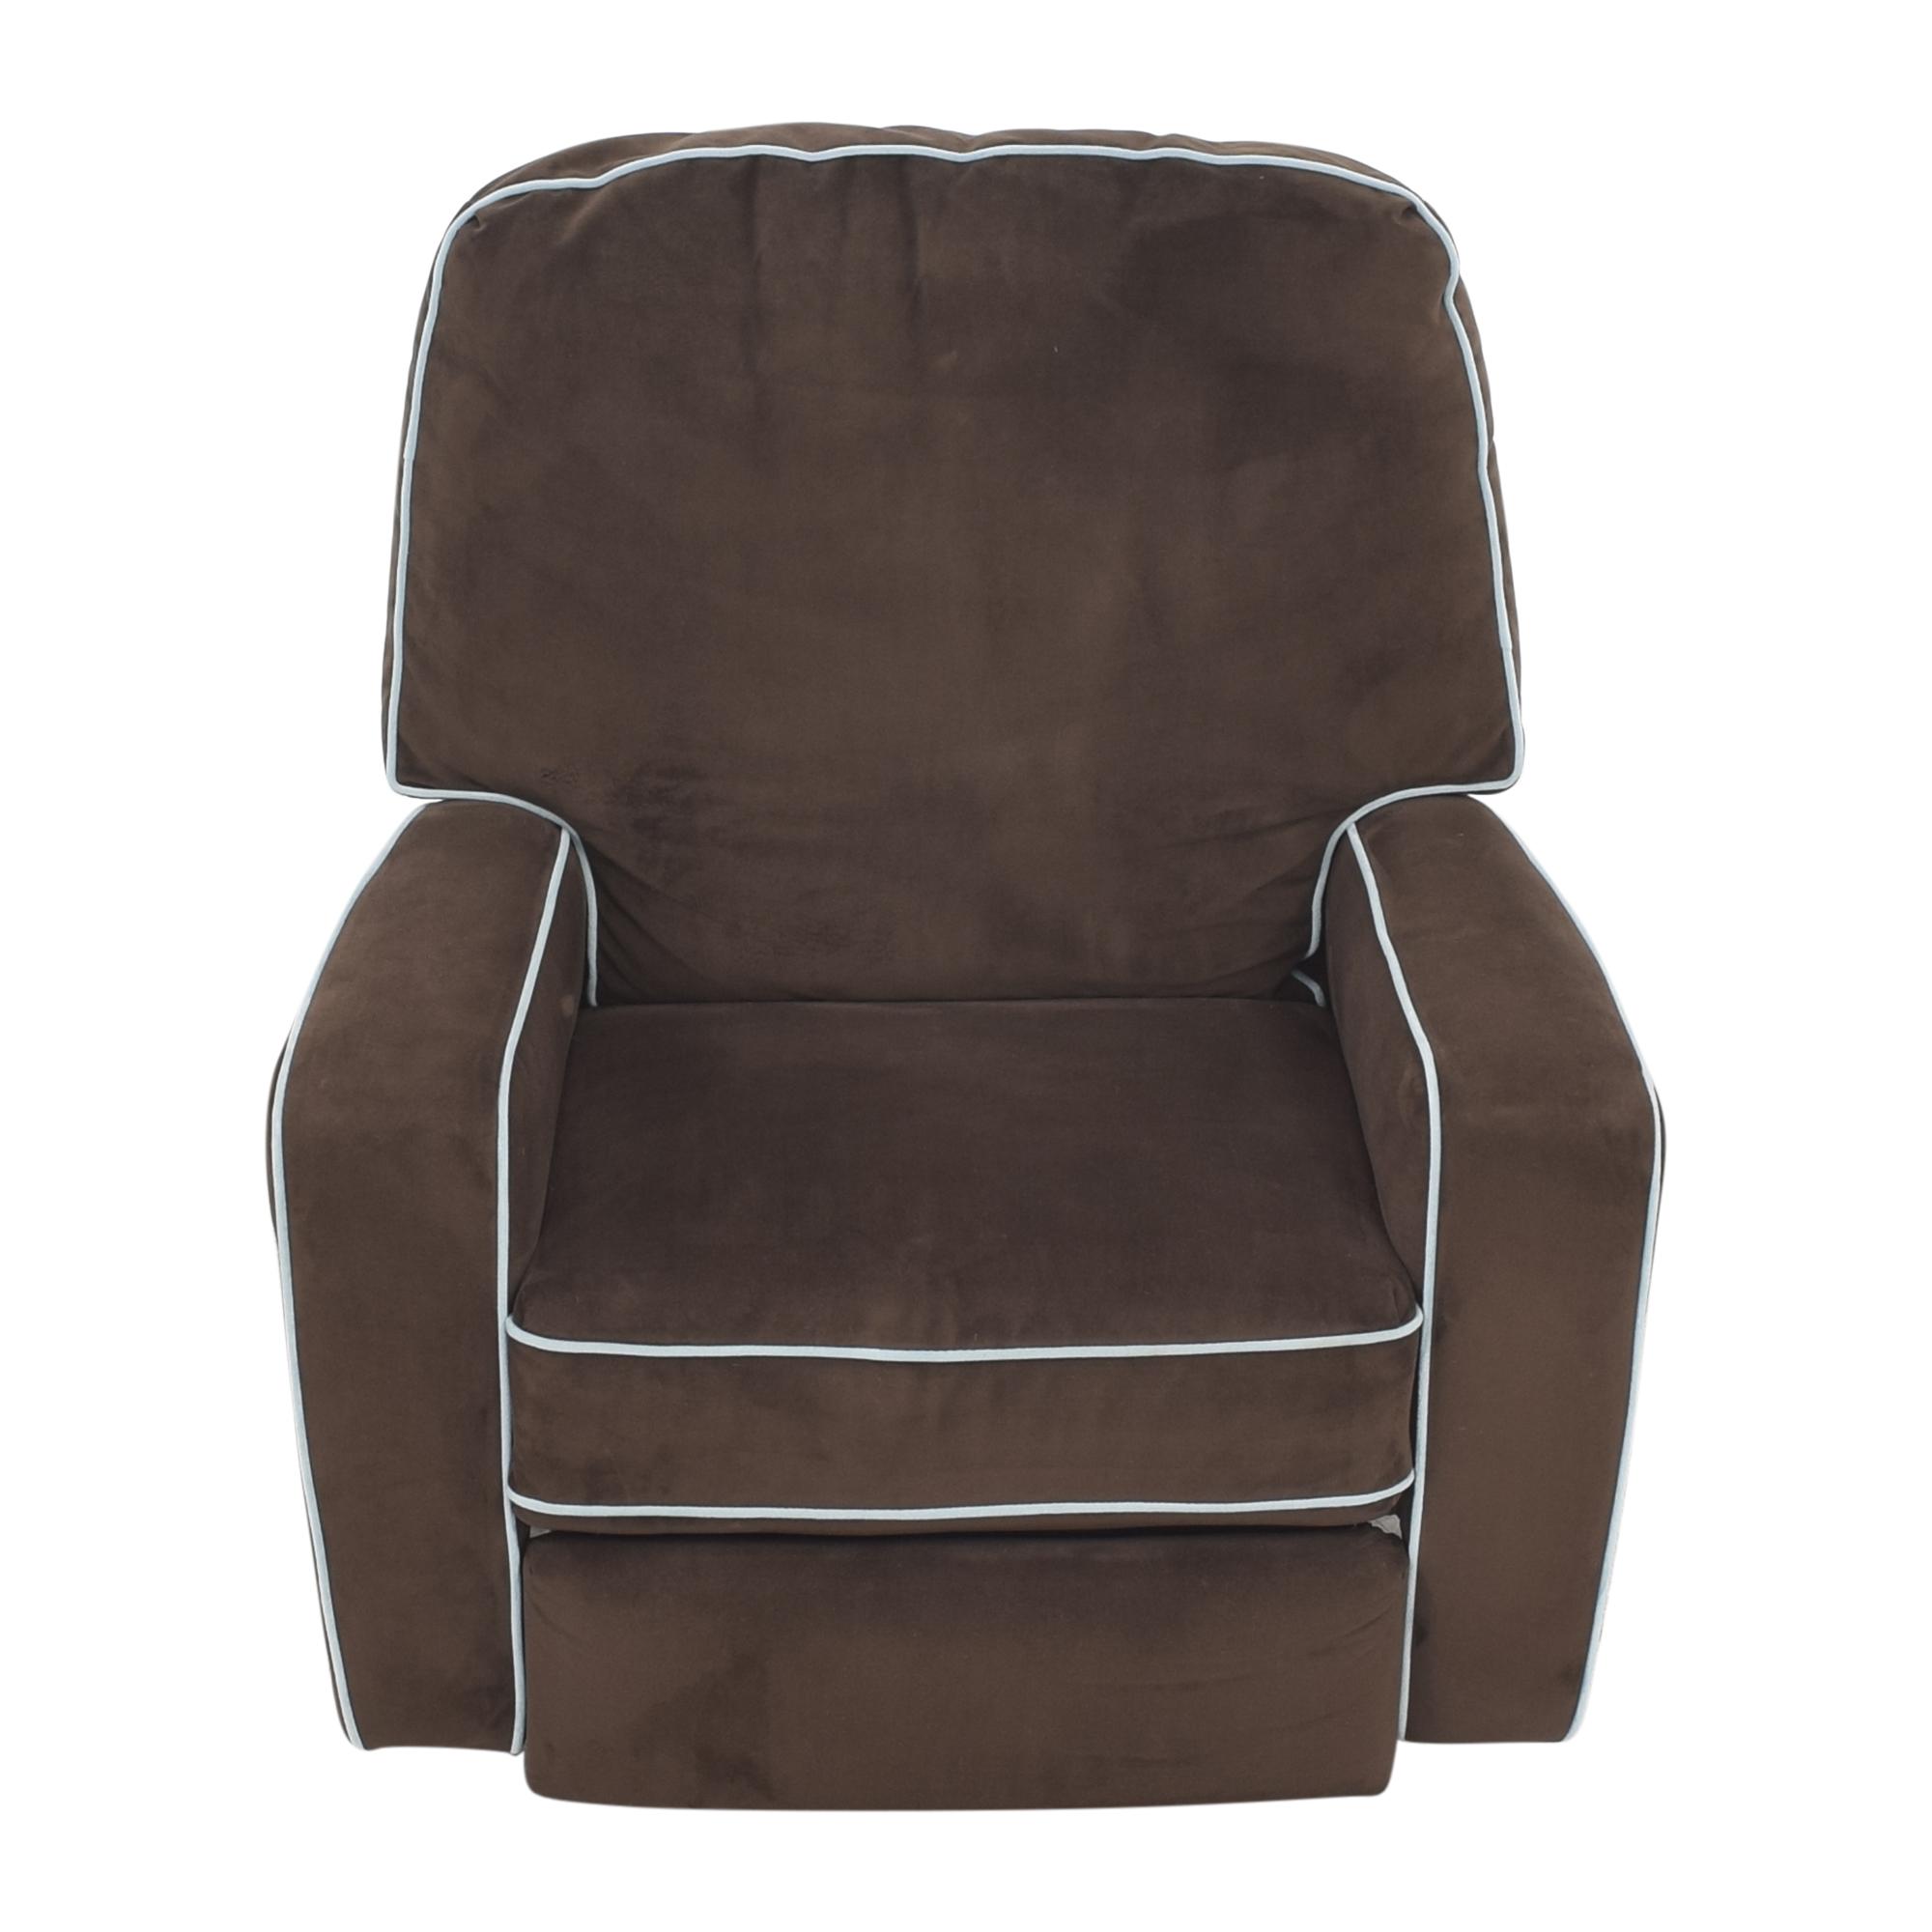 Best Chairs Best Chairs Bilana Swivel Glider Recliner Chairs